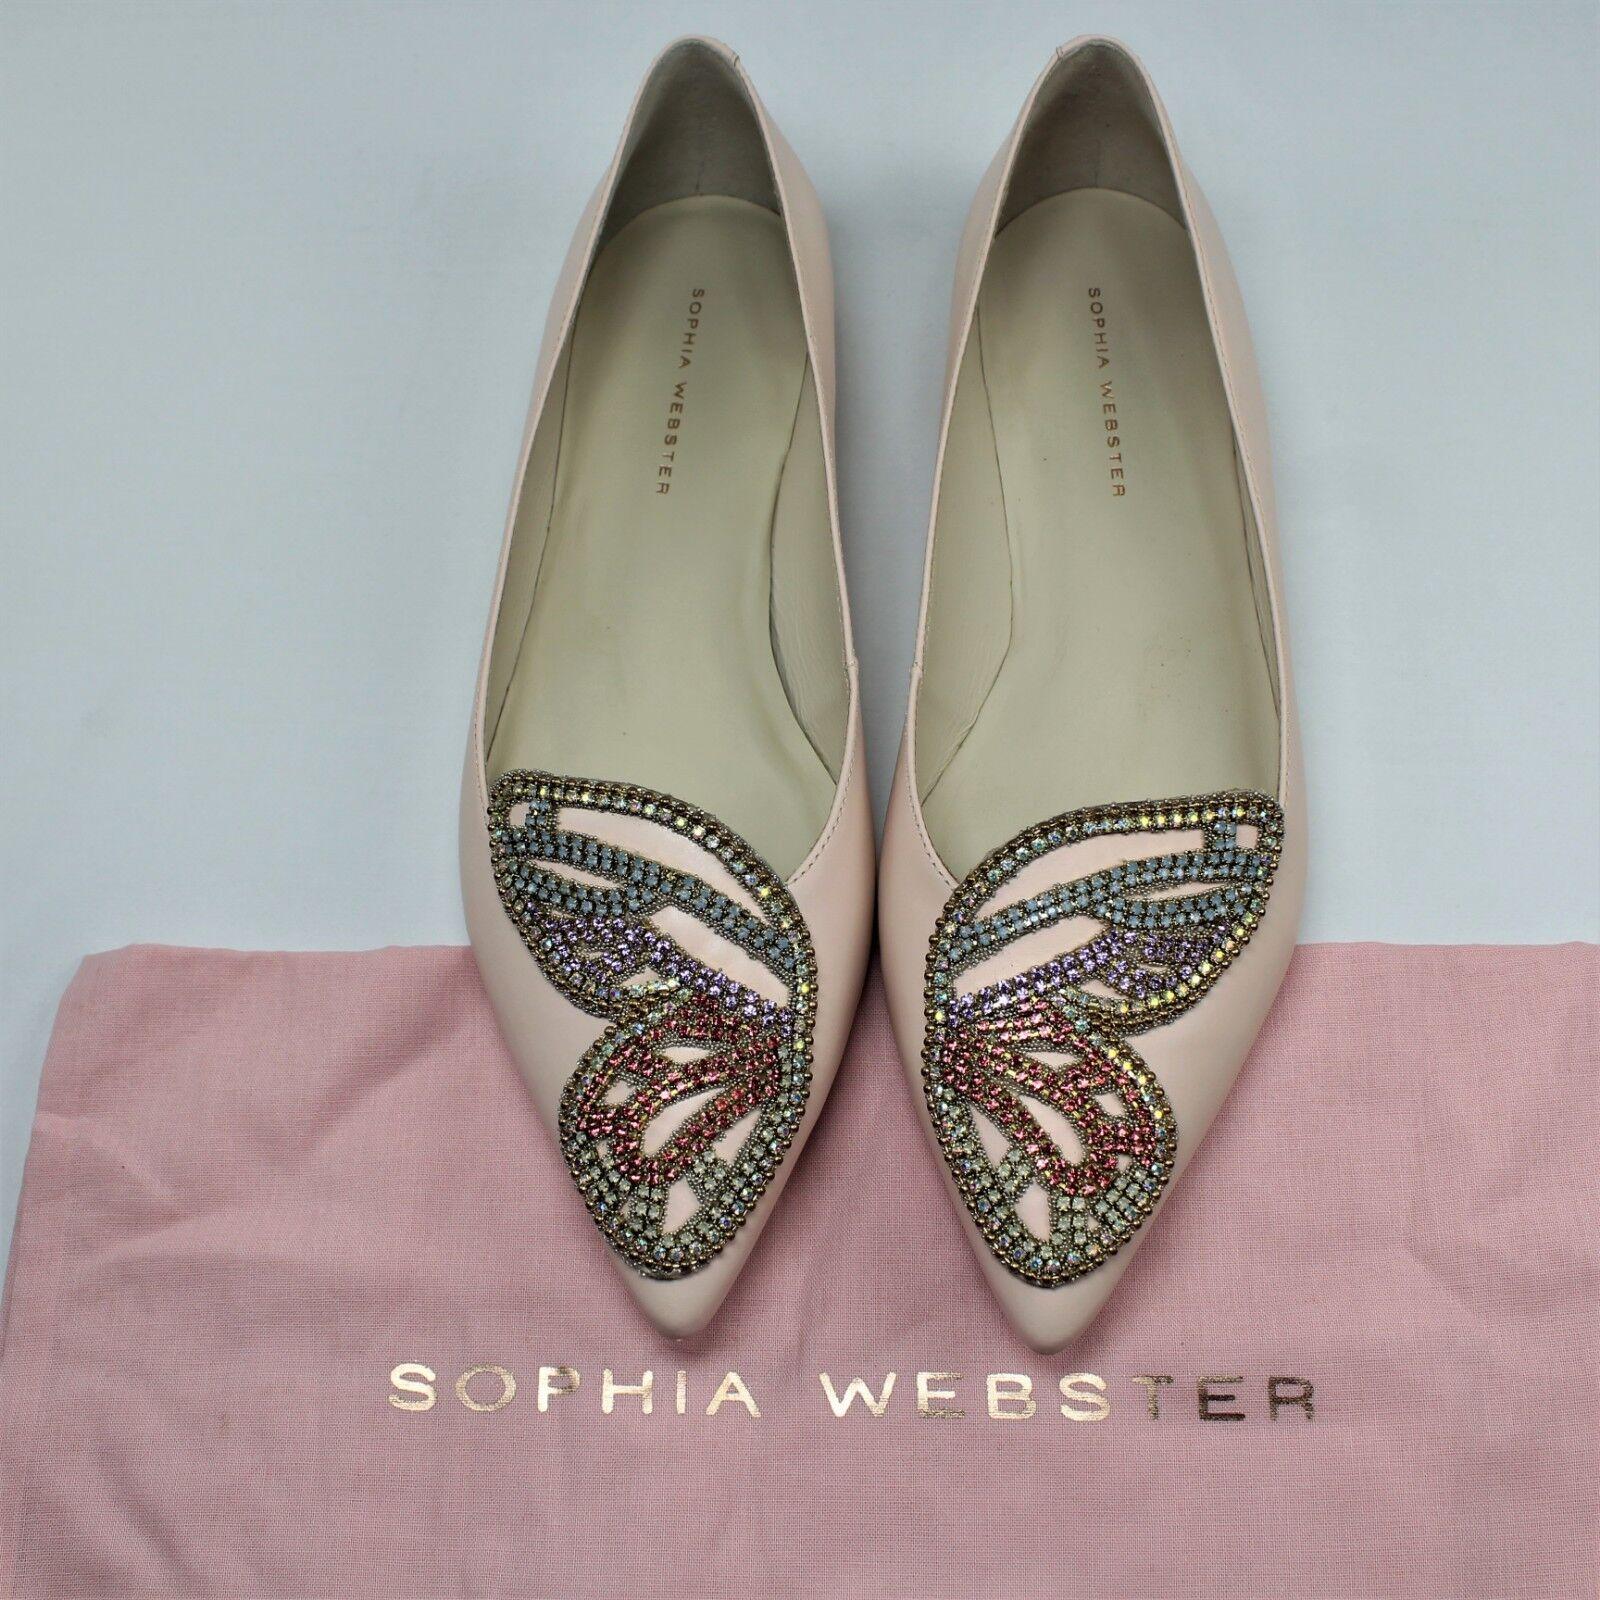 Sophia Webster Bibi Butterfly Crystal Ballet Flat shoes New In Box  Choose Size